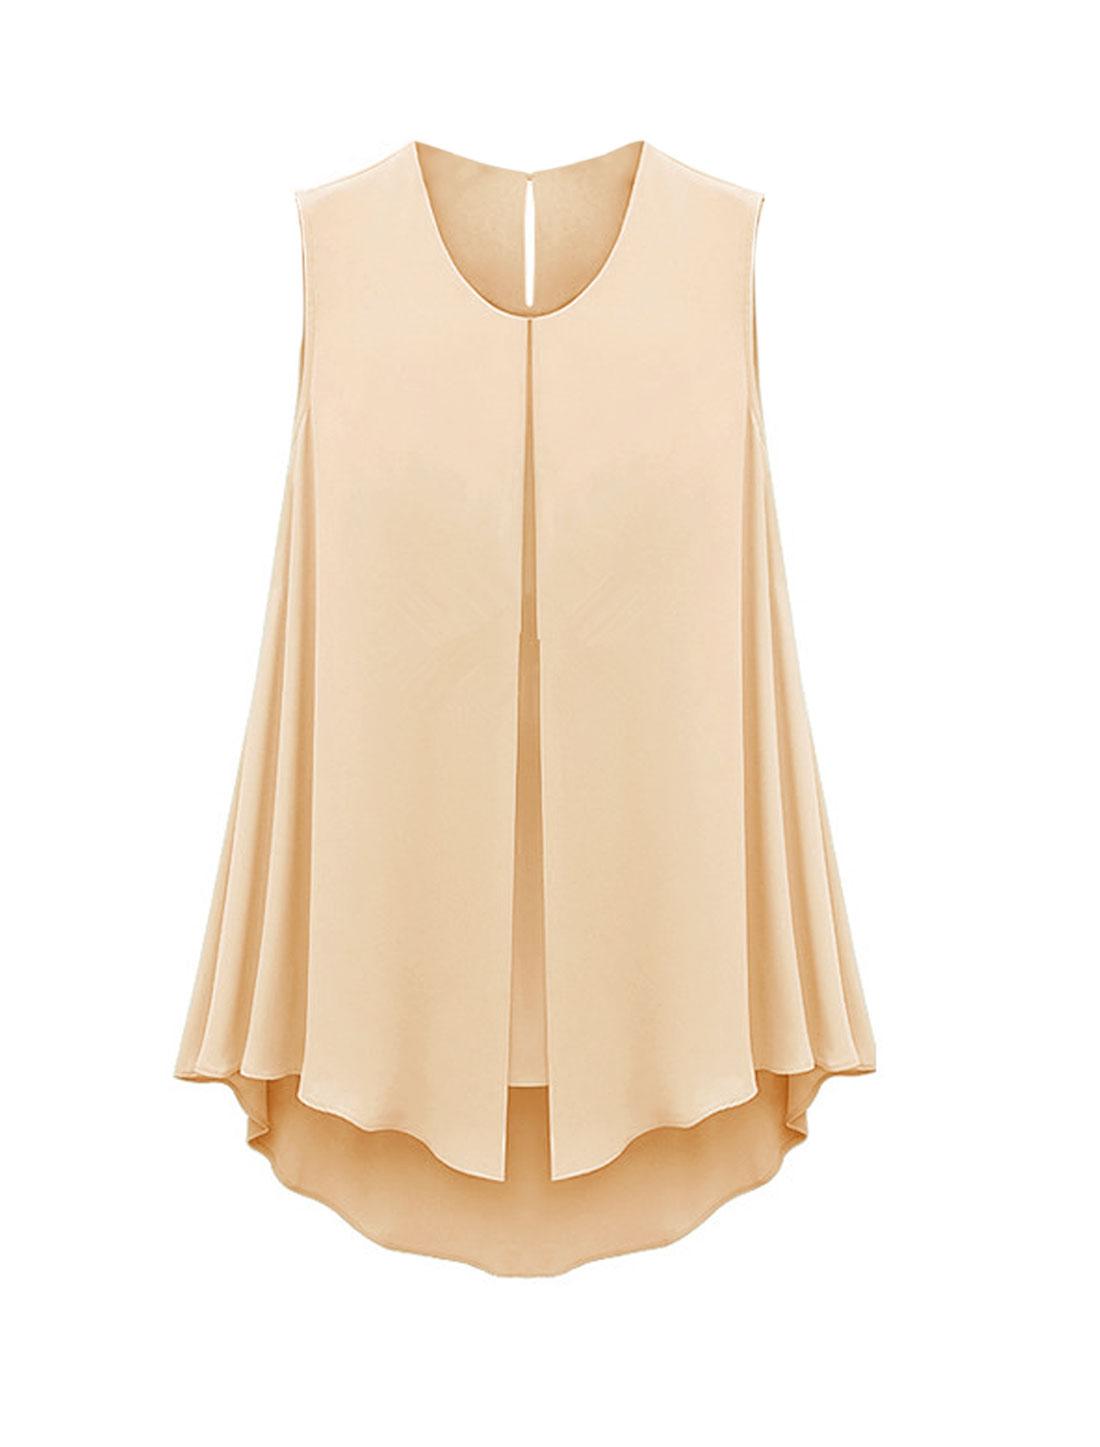 Ladies Round Neck Layered Asymmetric Hem Summer Chiffon Blouse Pale Pink S